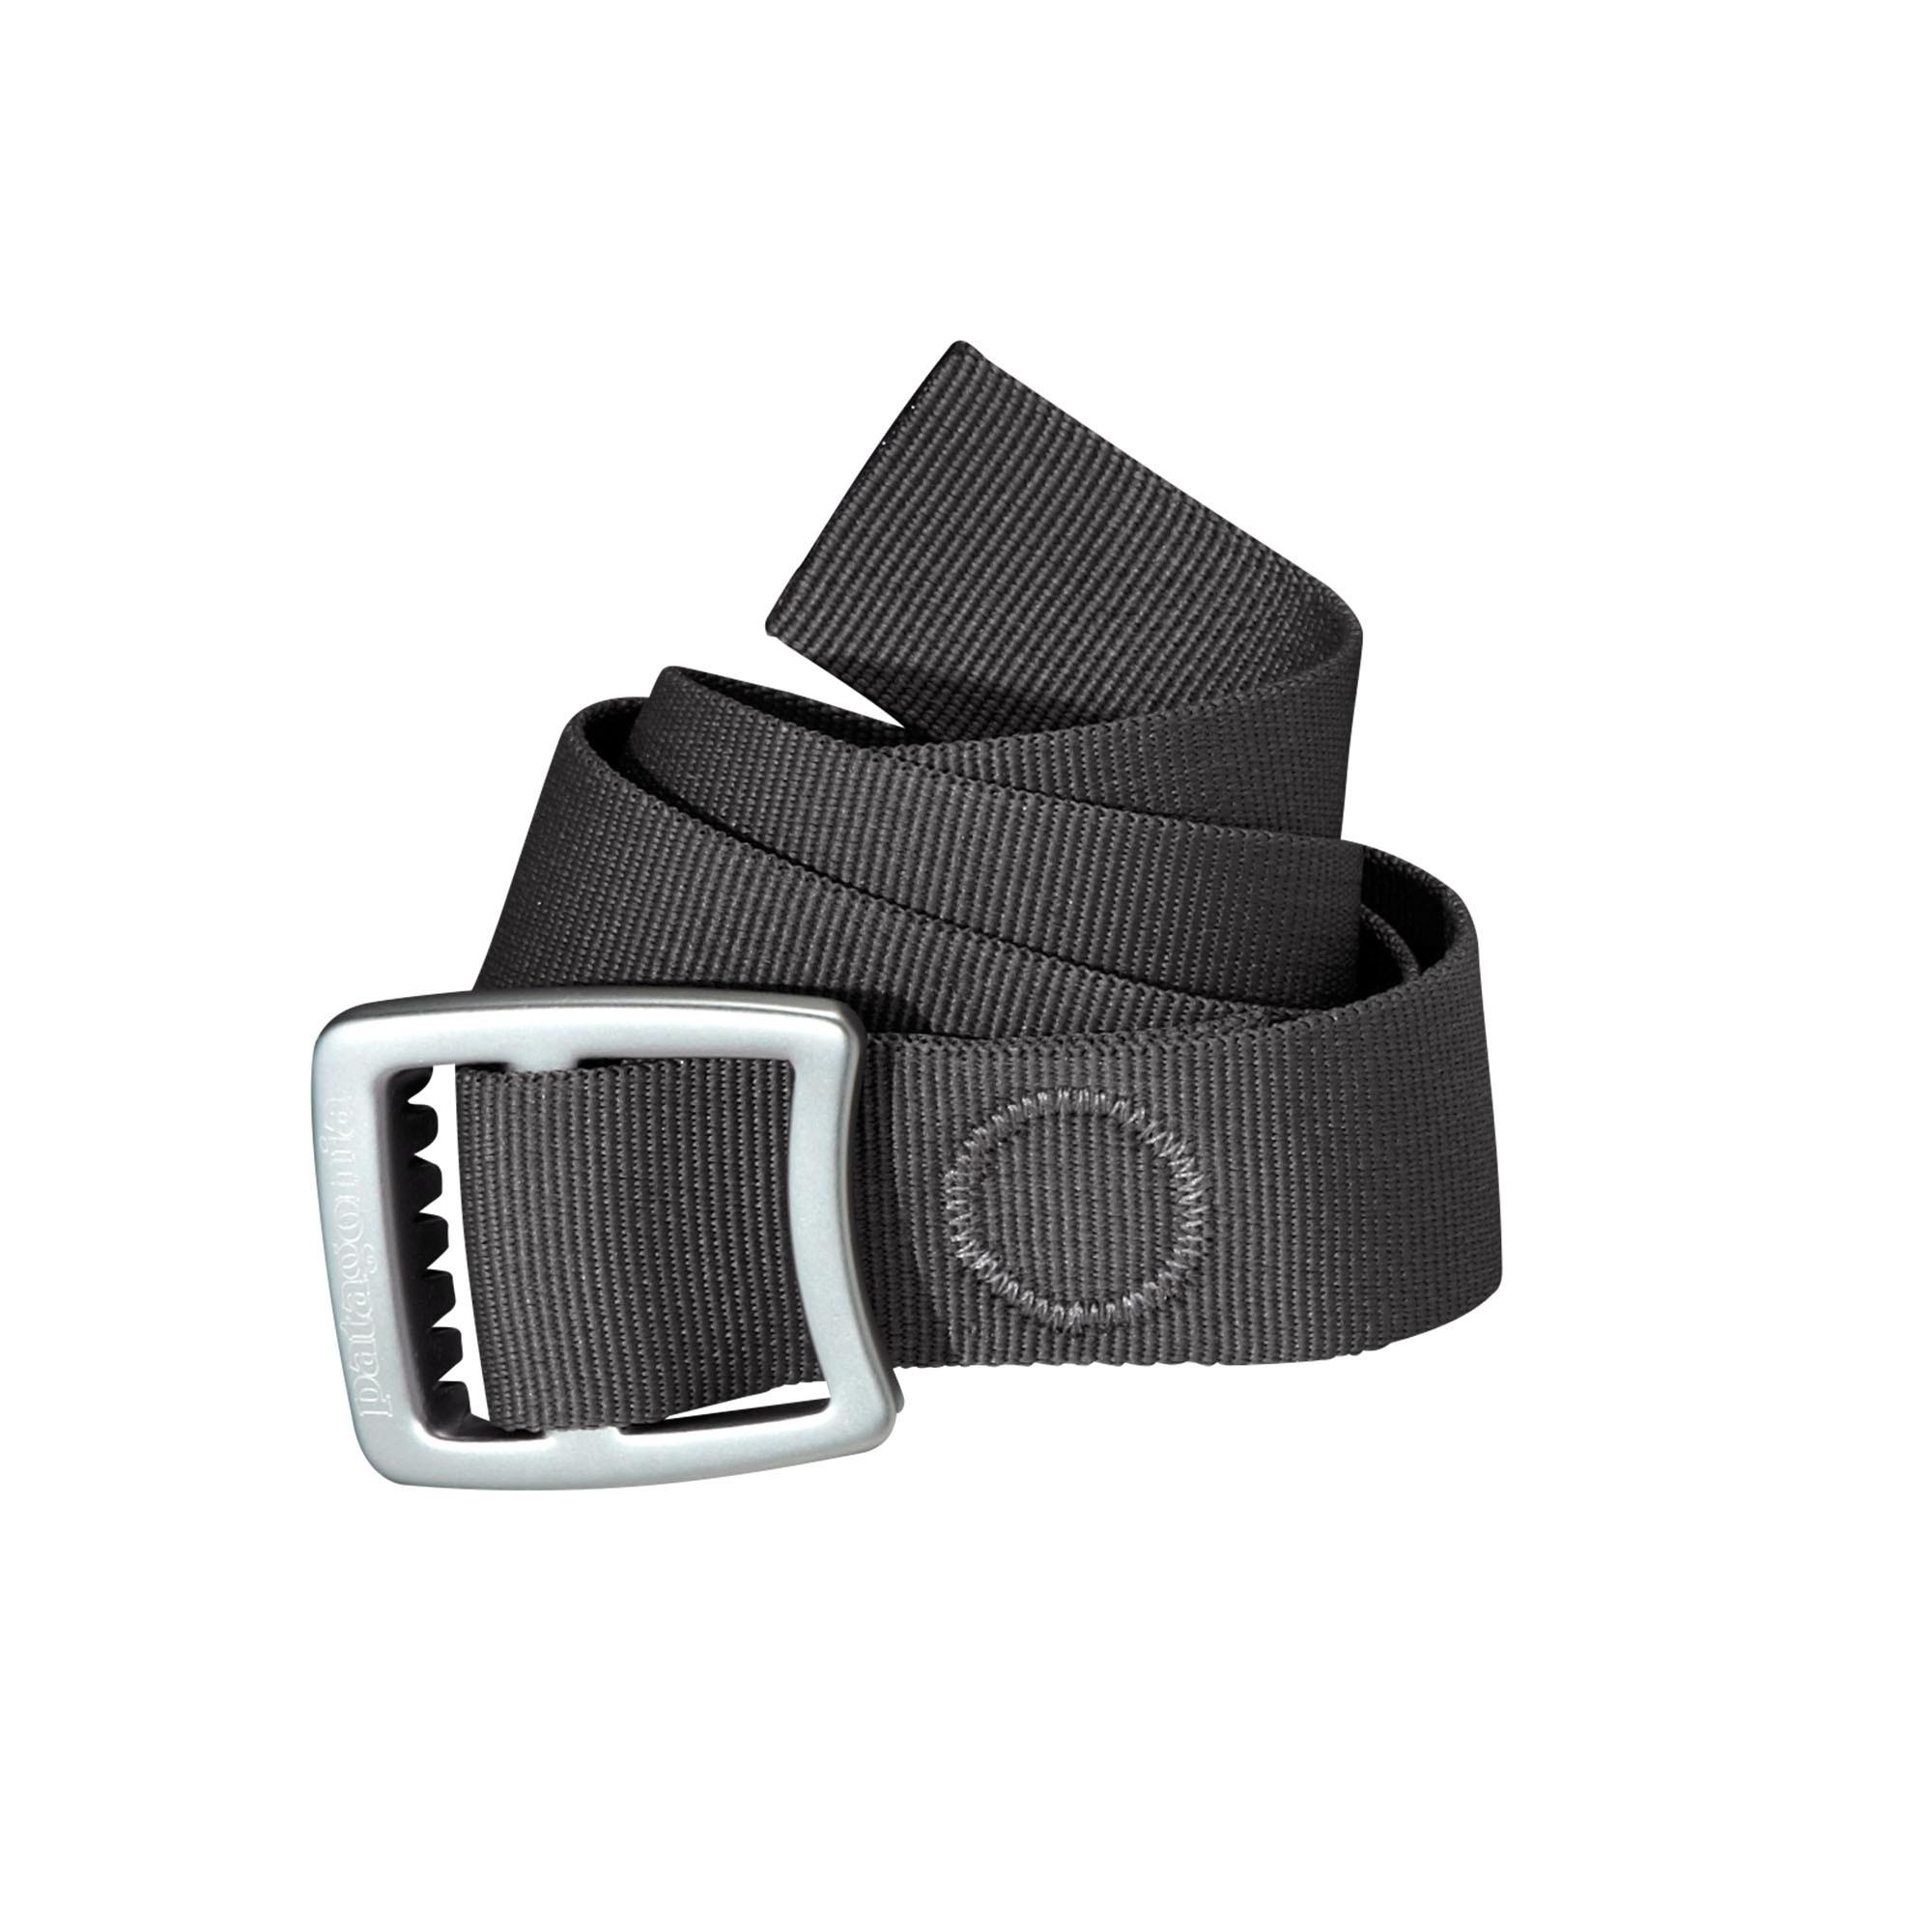 Patagonia Tech Web Belt -Forge Grey (FGE-961)